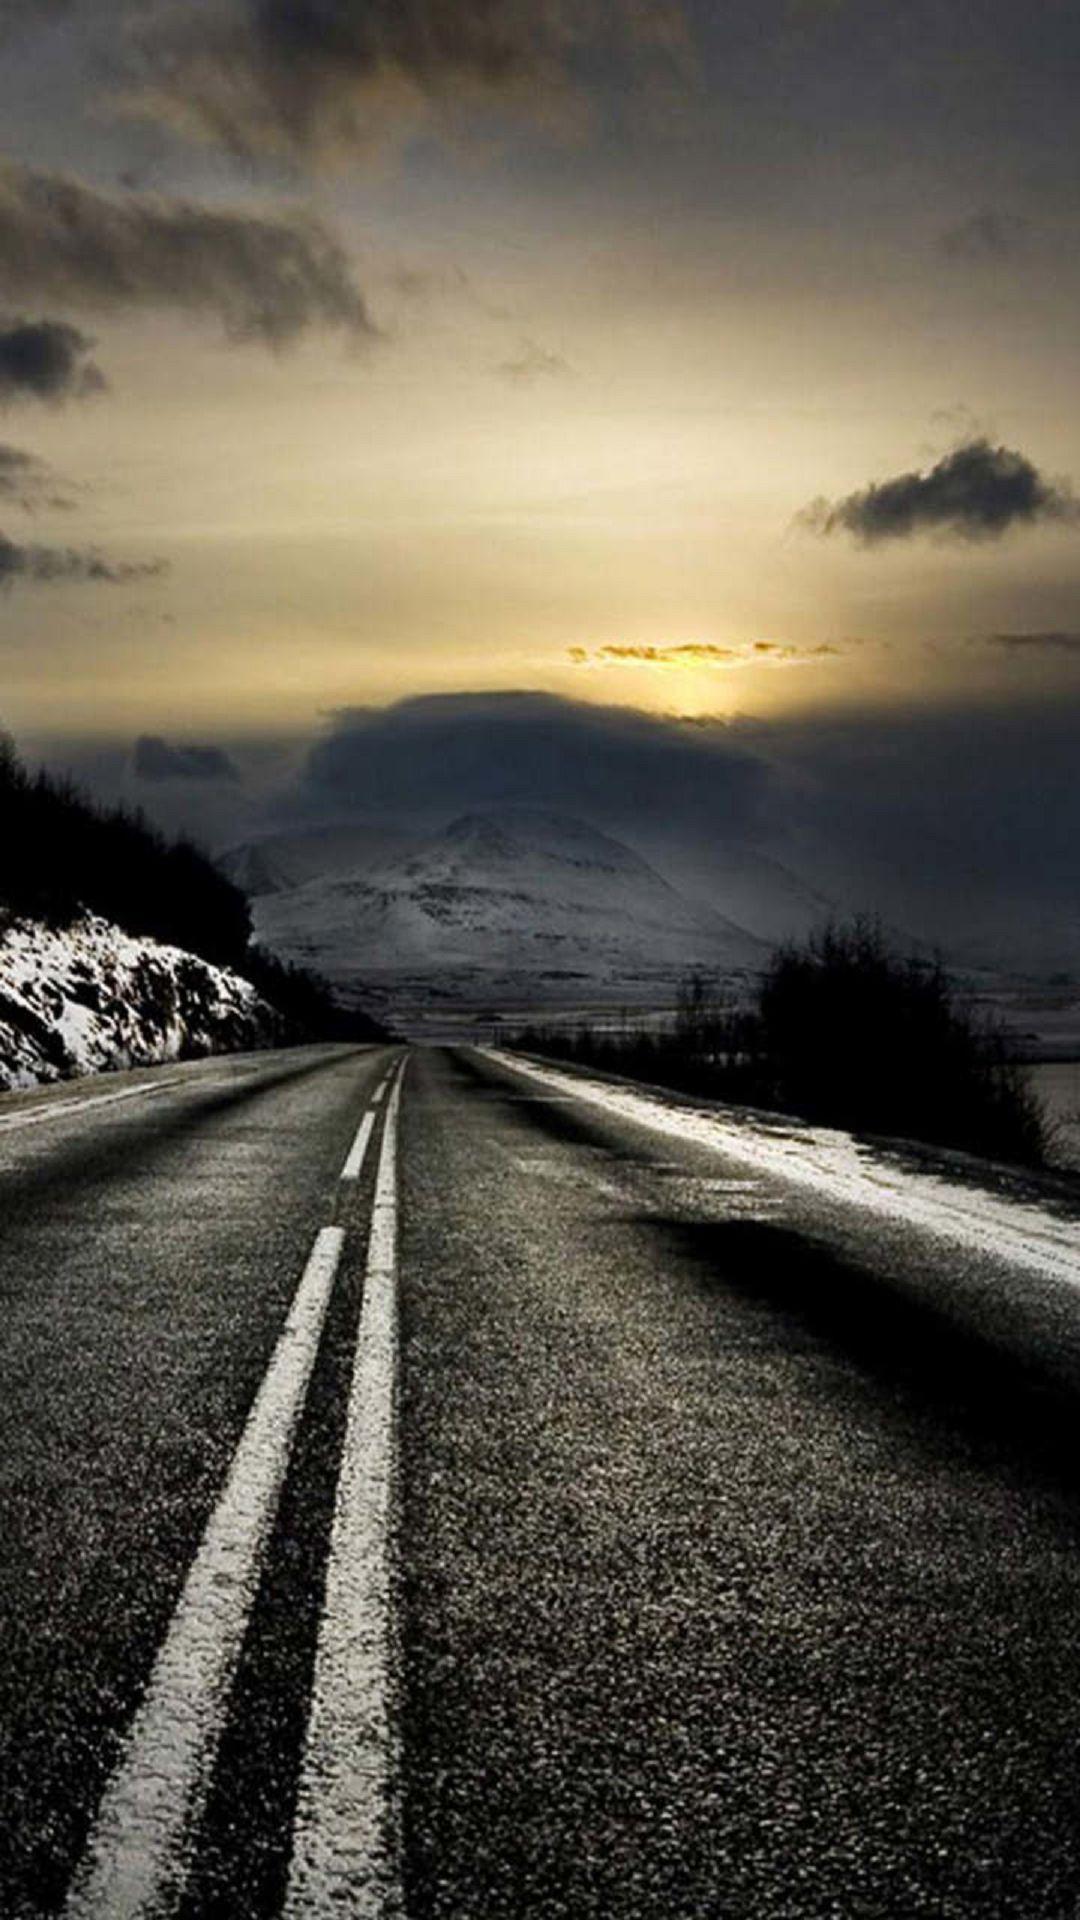 Mountain Road Sunrise iPhone 6 Plus HD Wallpaper / iPod